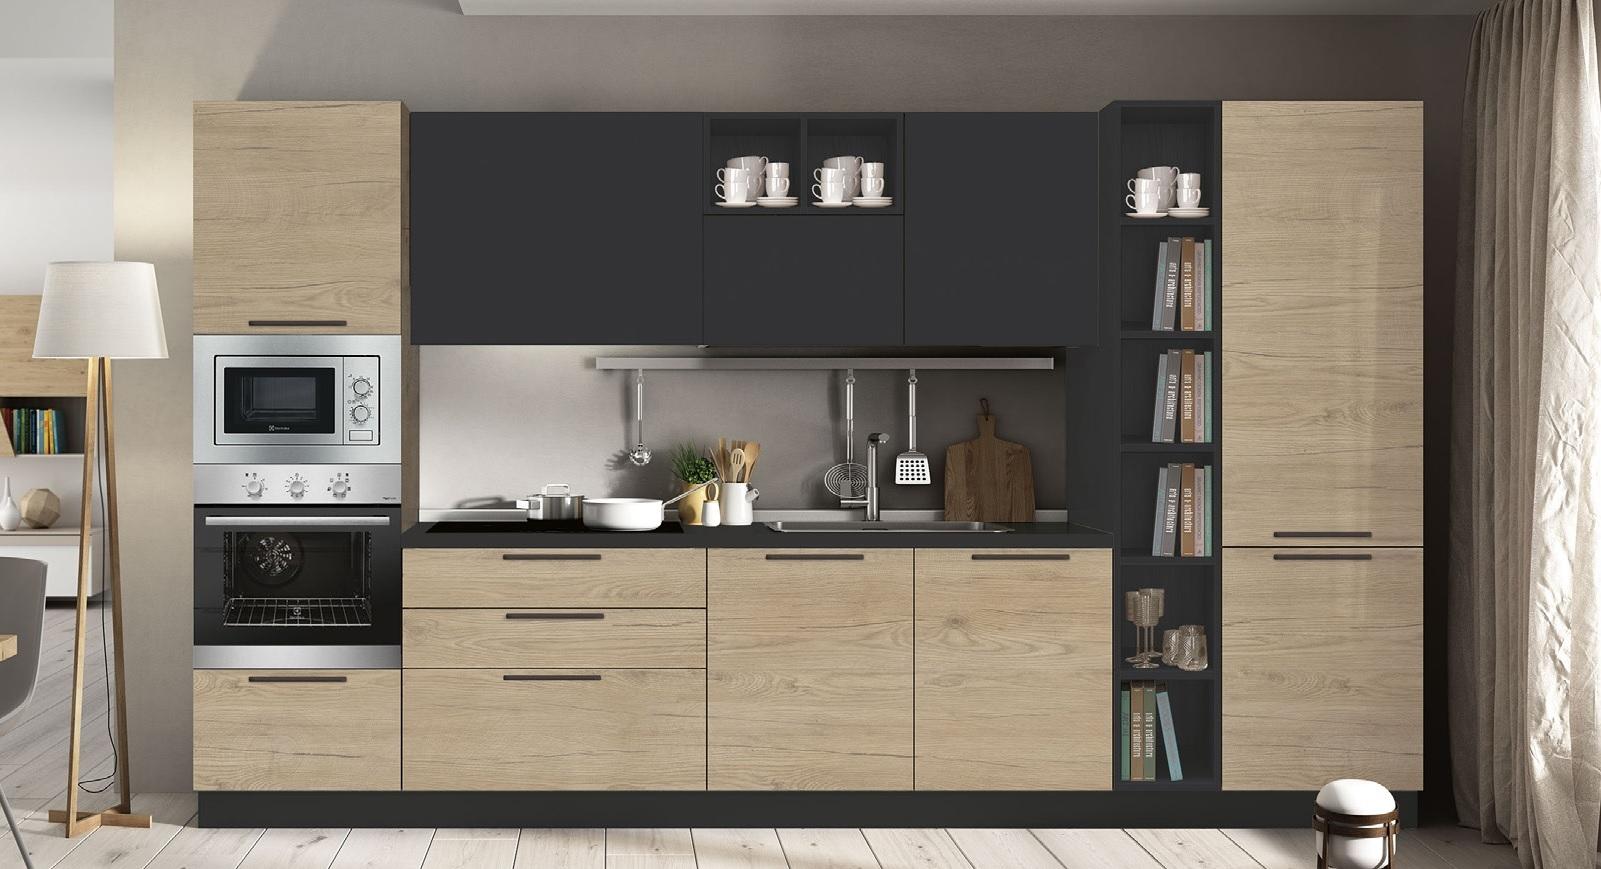 Best Cucine Con Elettrodomestici Photos - Ideas & Design 2017 ...